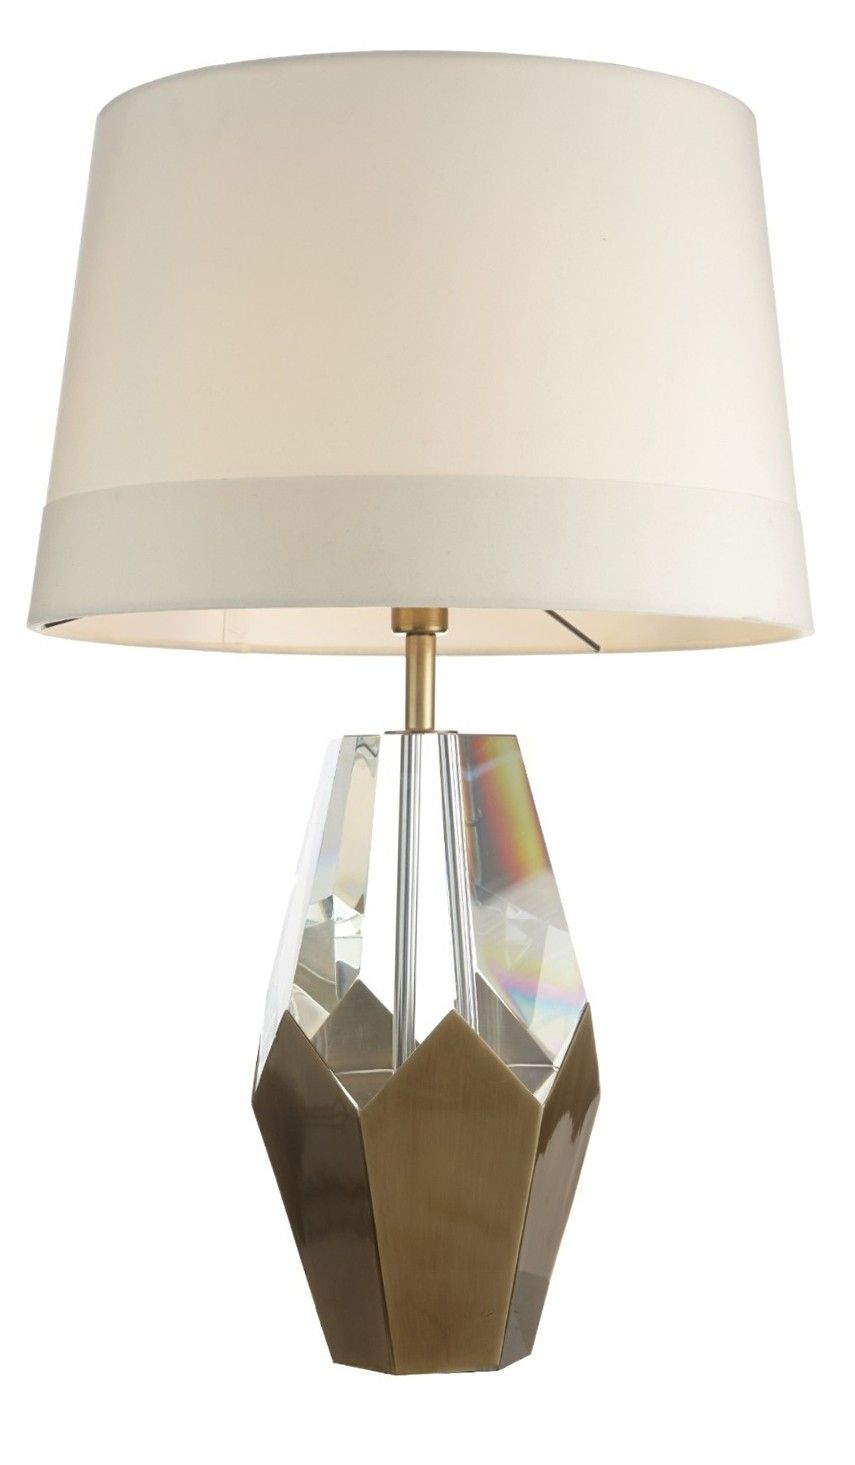 RV ASTLEY TABLE Lamp Kinsey BRAND NEW